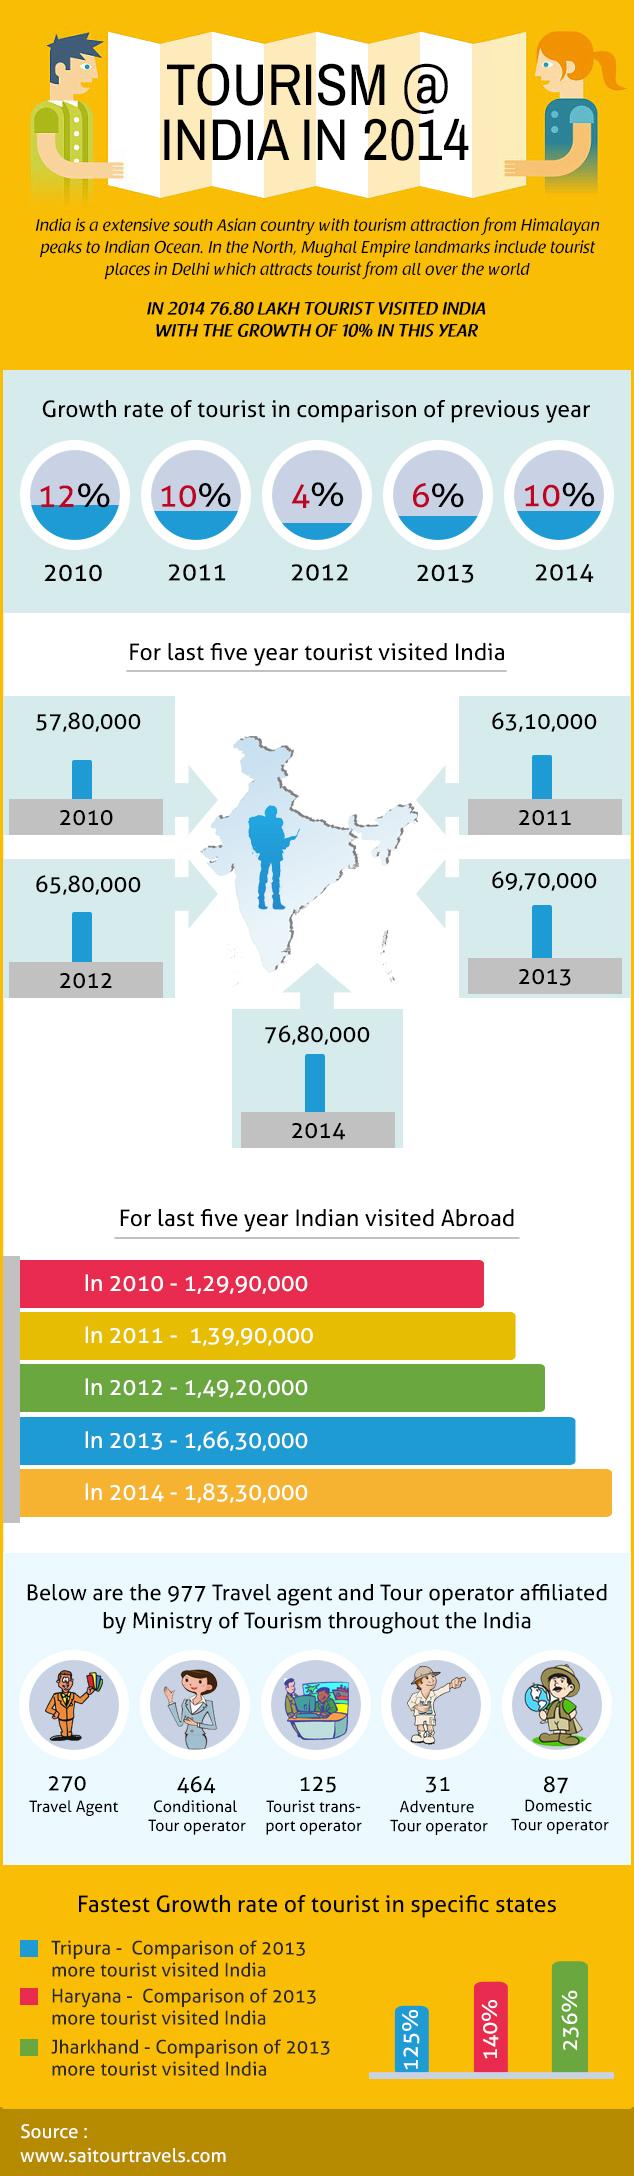 Tourism @ India in 2014